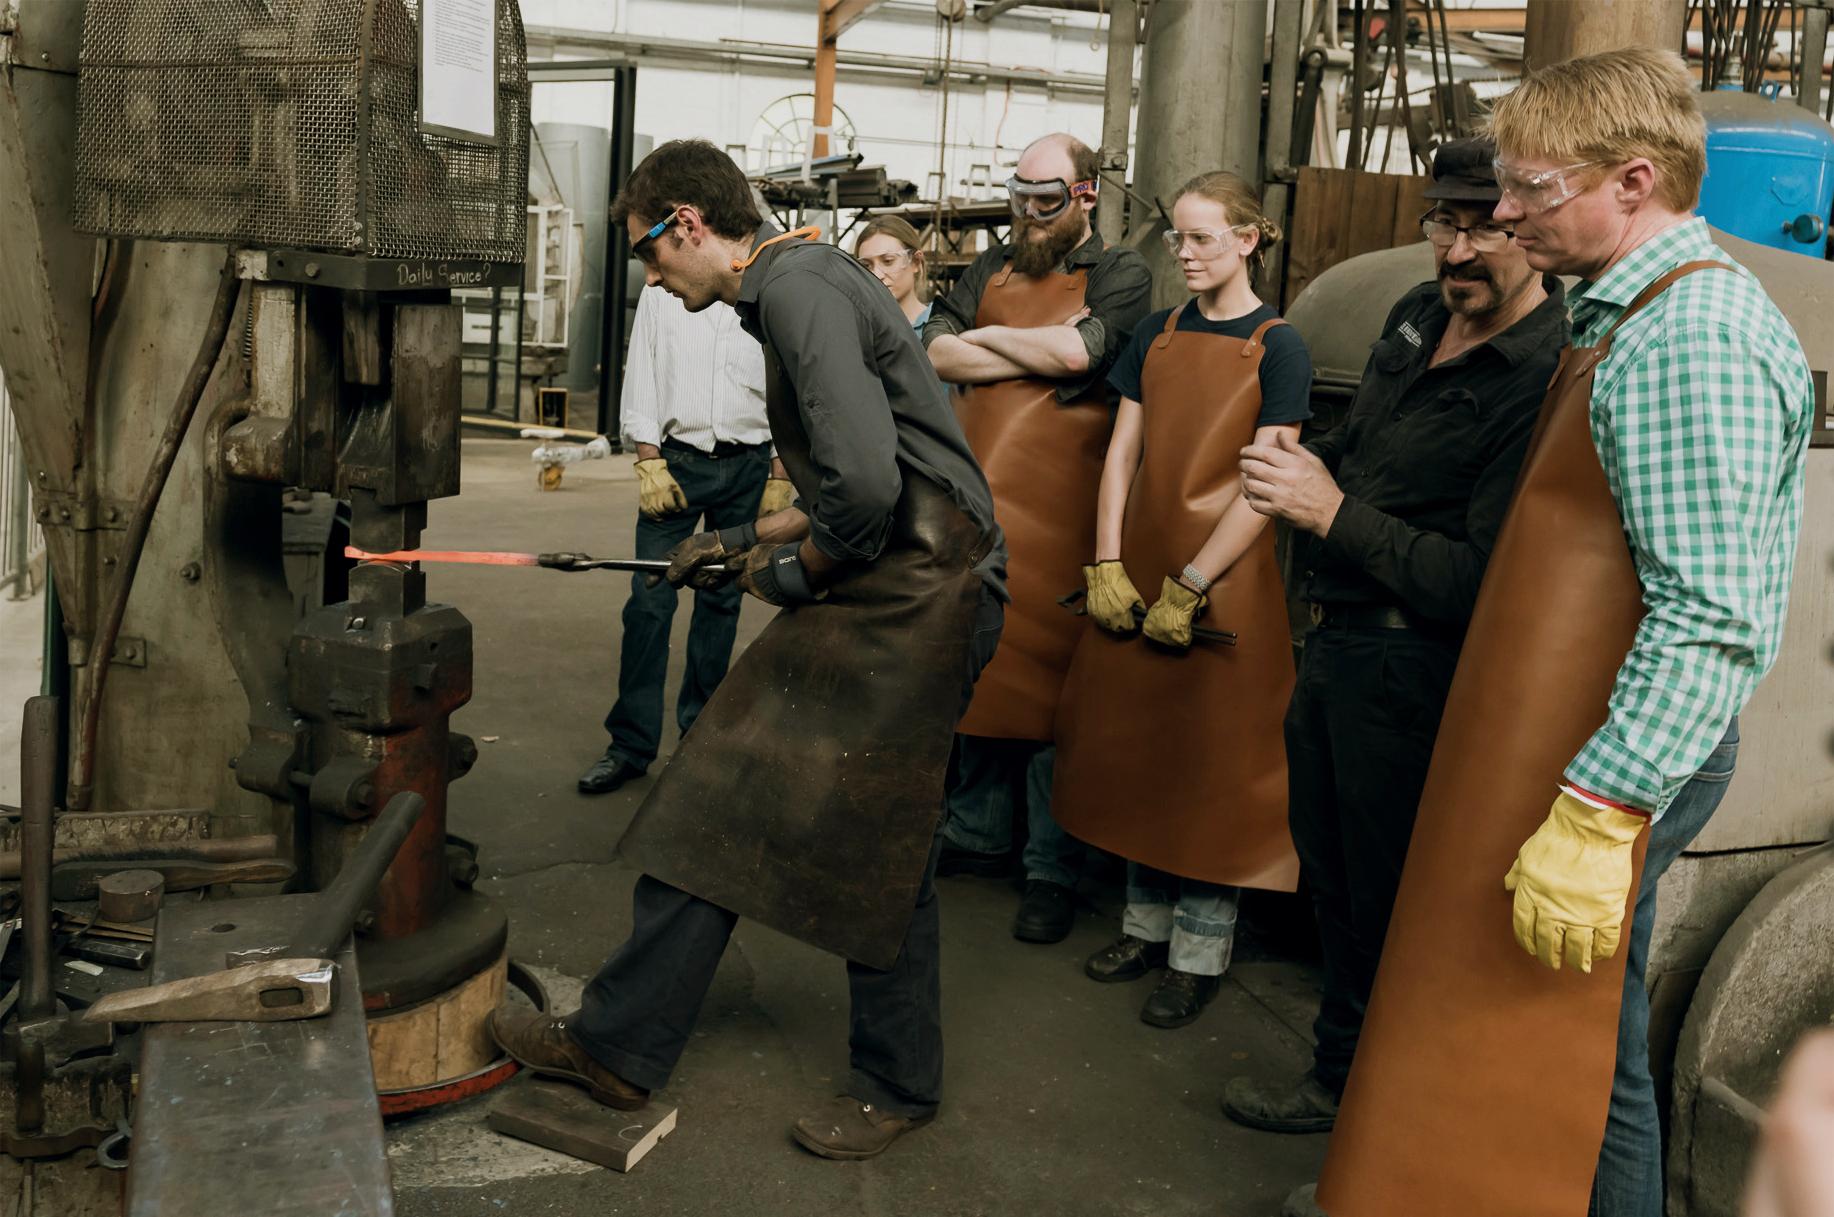 Matt demonstrating forging on a power hammer at Eveleigh Works, Redfern, Sydney